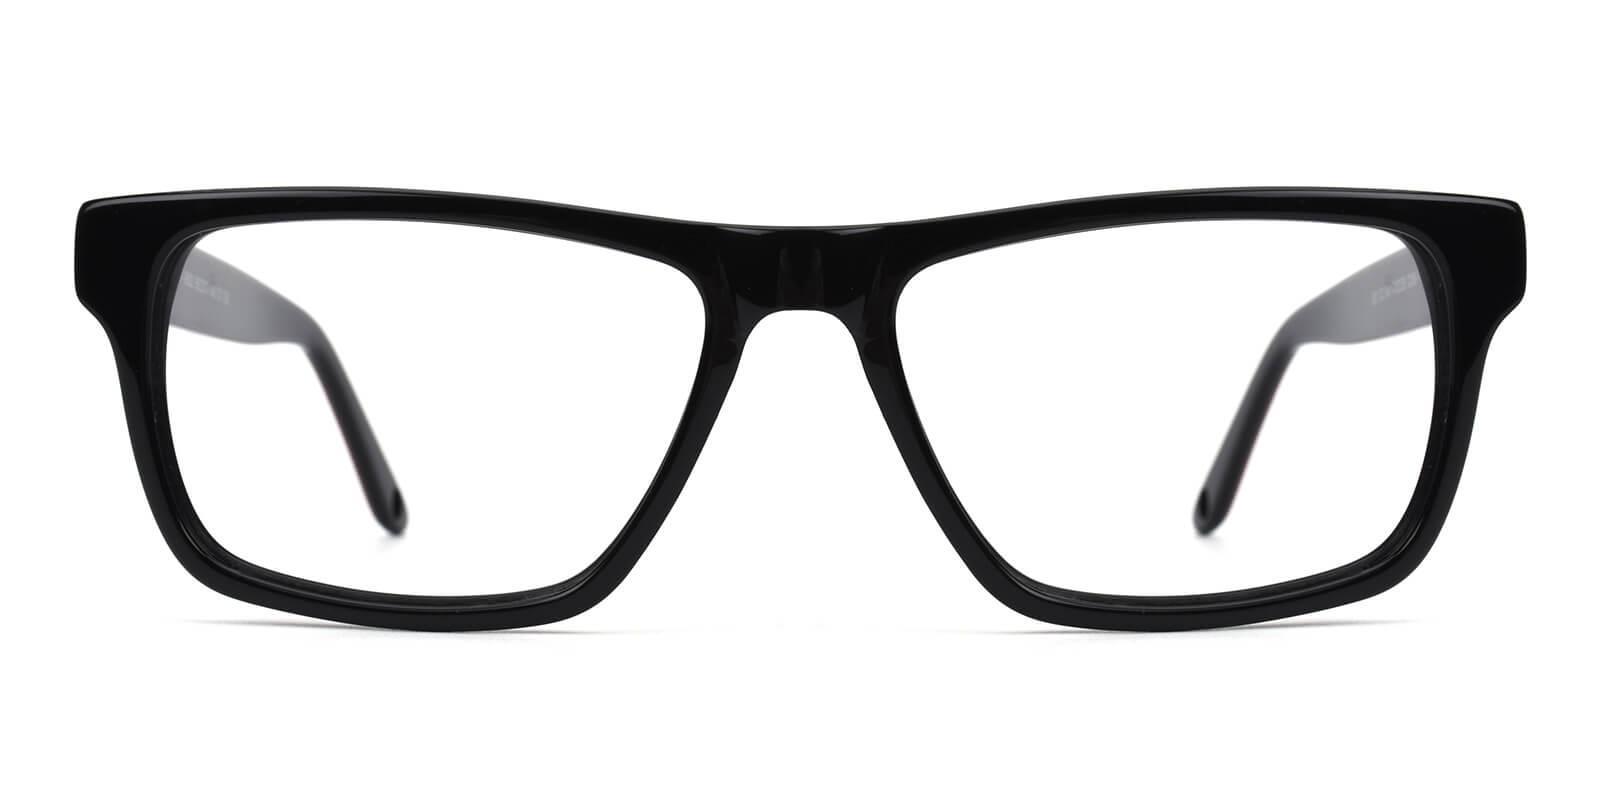 Nightdream-Black-Square-Acetate-Eyeglasses-additional2